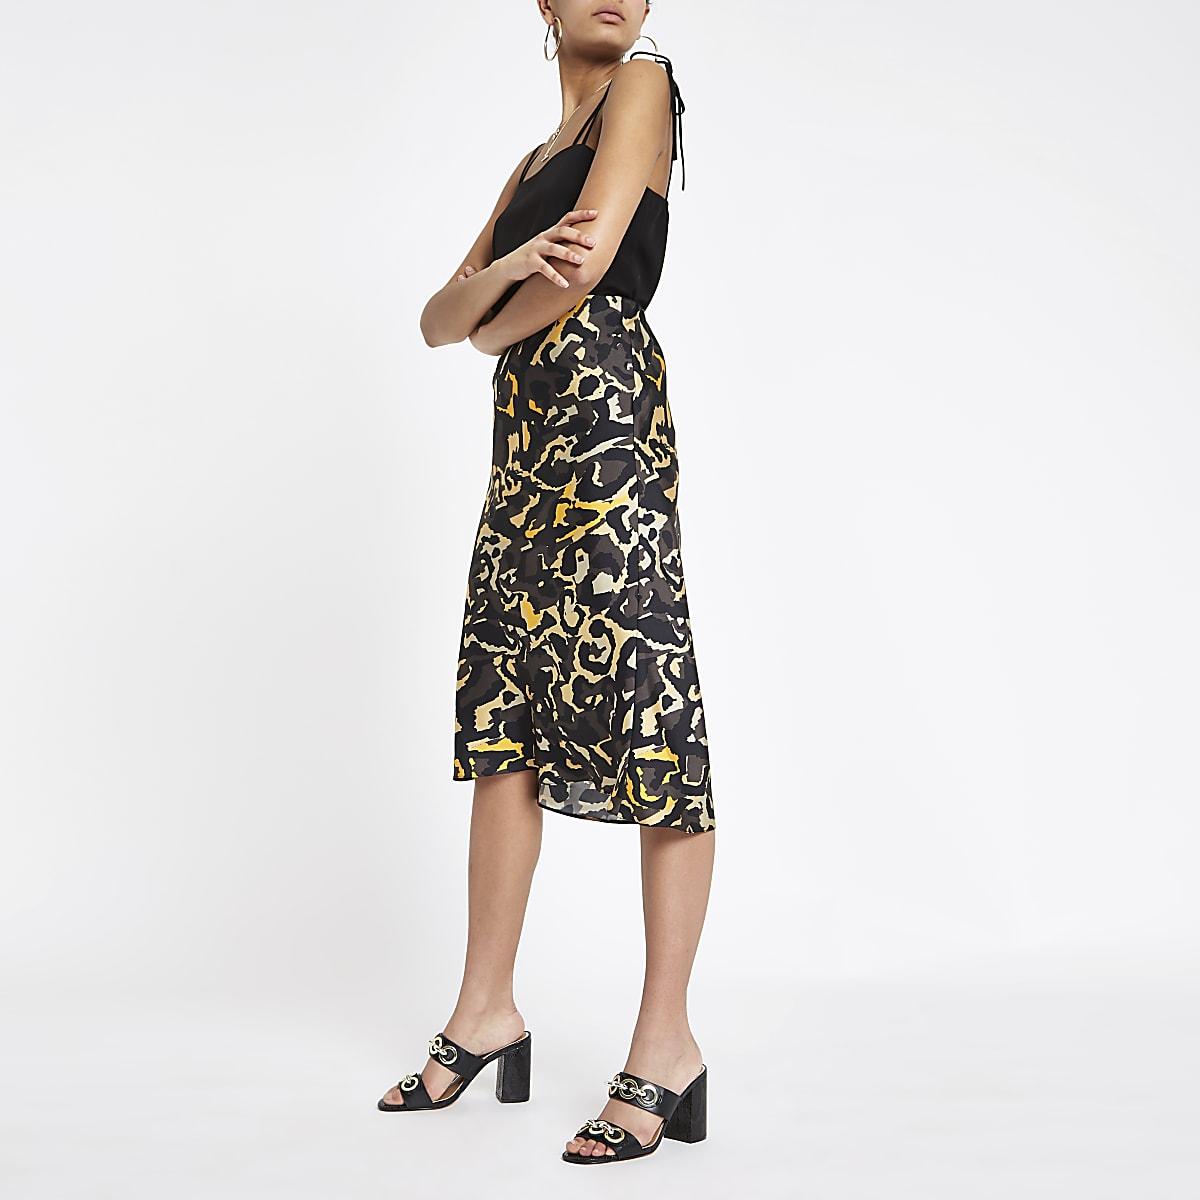 Khaki camo bias cut midi skirt